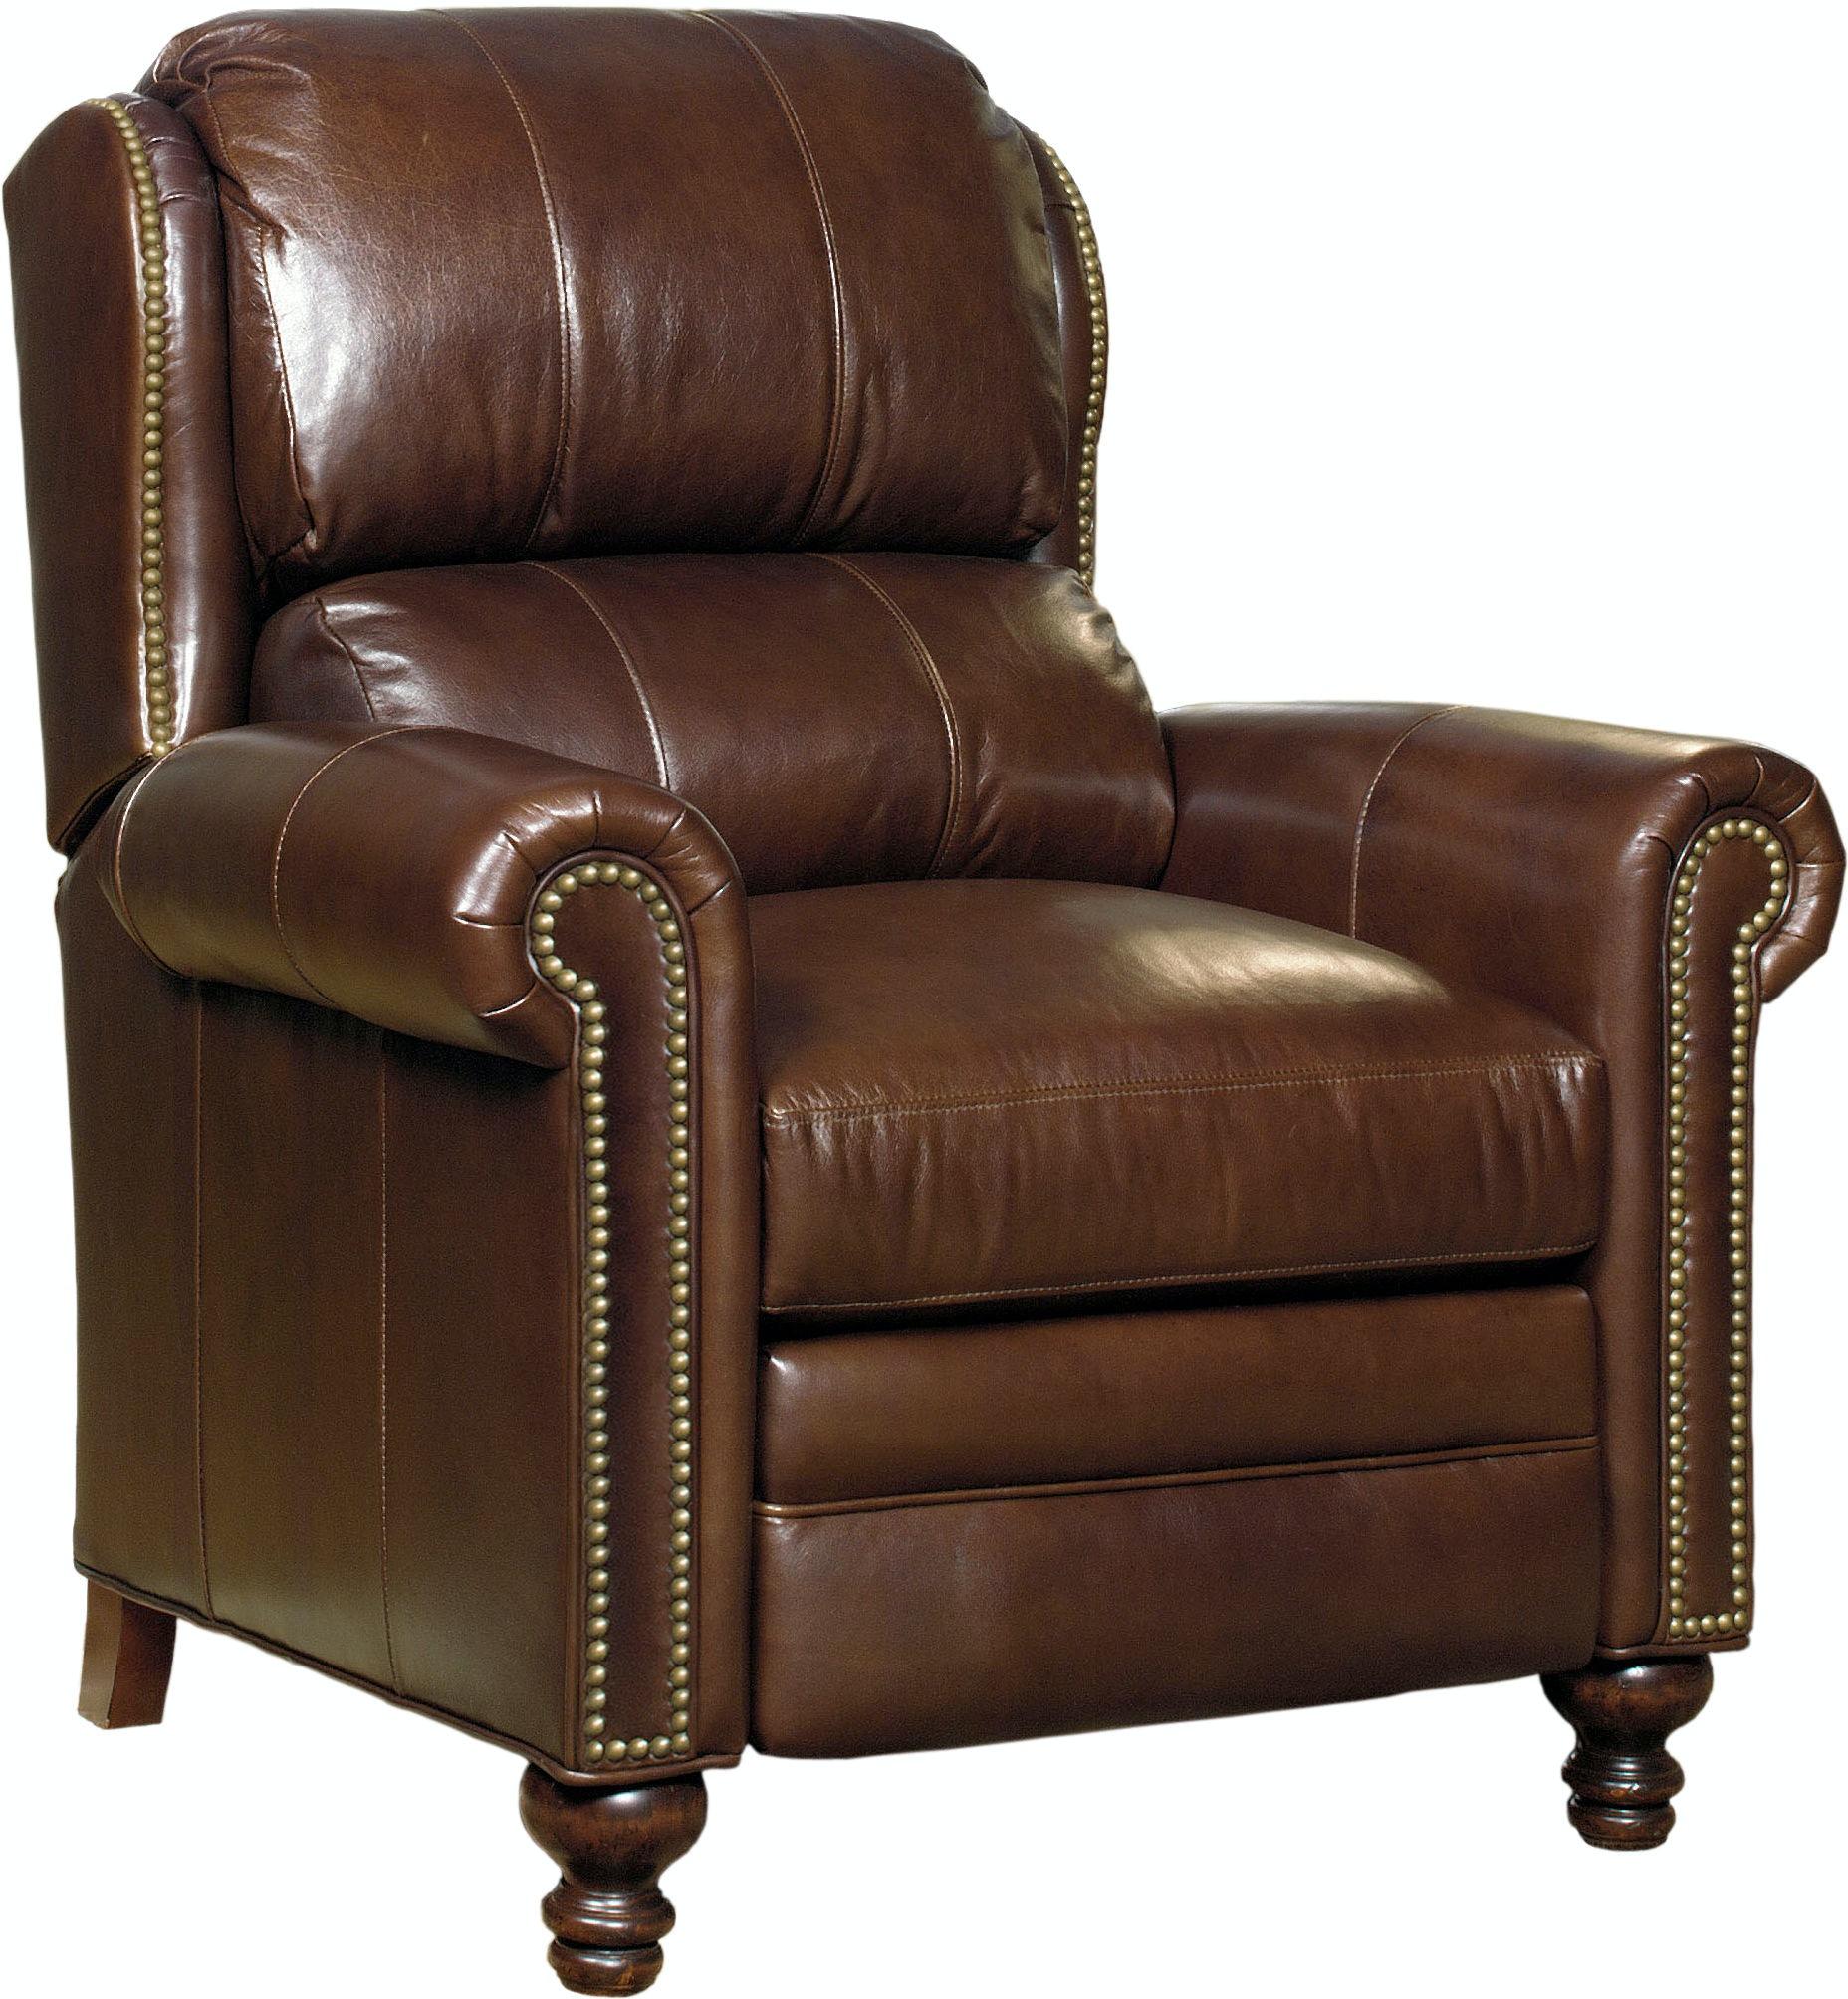 bradington young furniture living room satchel 3 way reclining lounger 3257